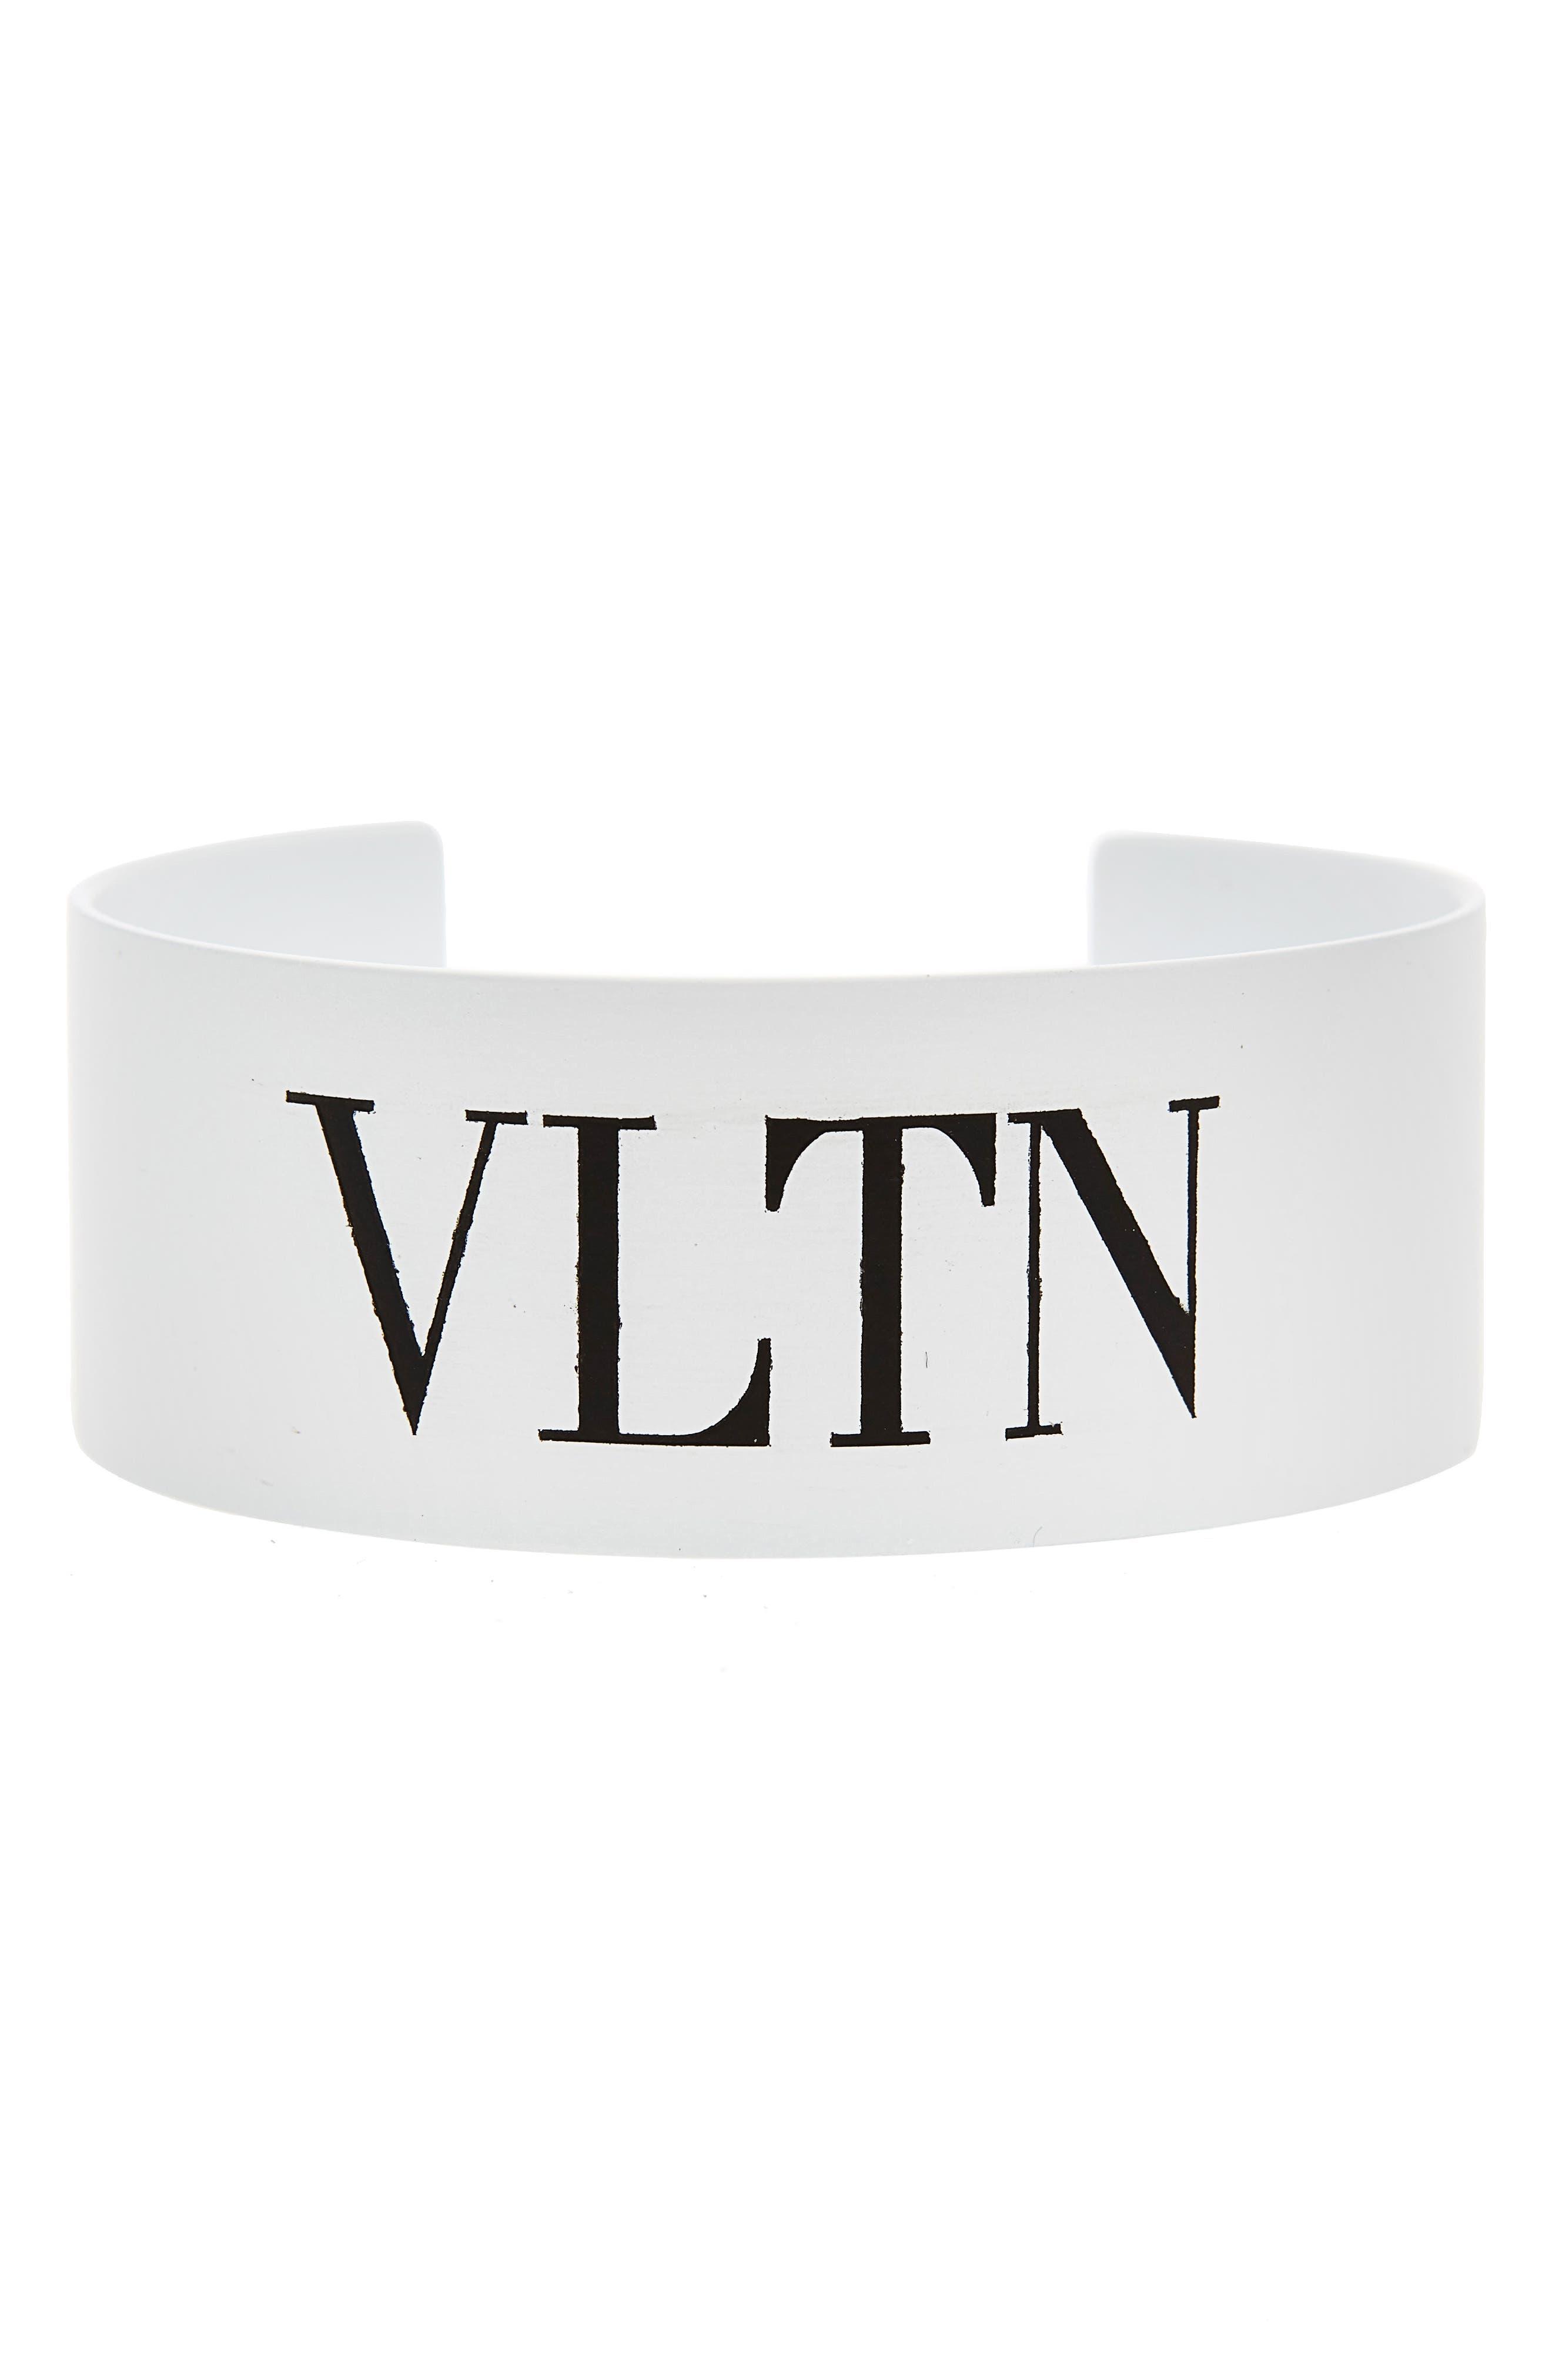 VLTN Medium Cuff Bracelet,                         Main,                         color, BIANCO/ NERO